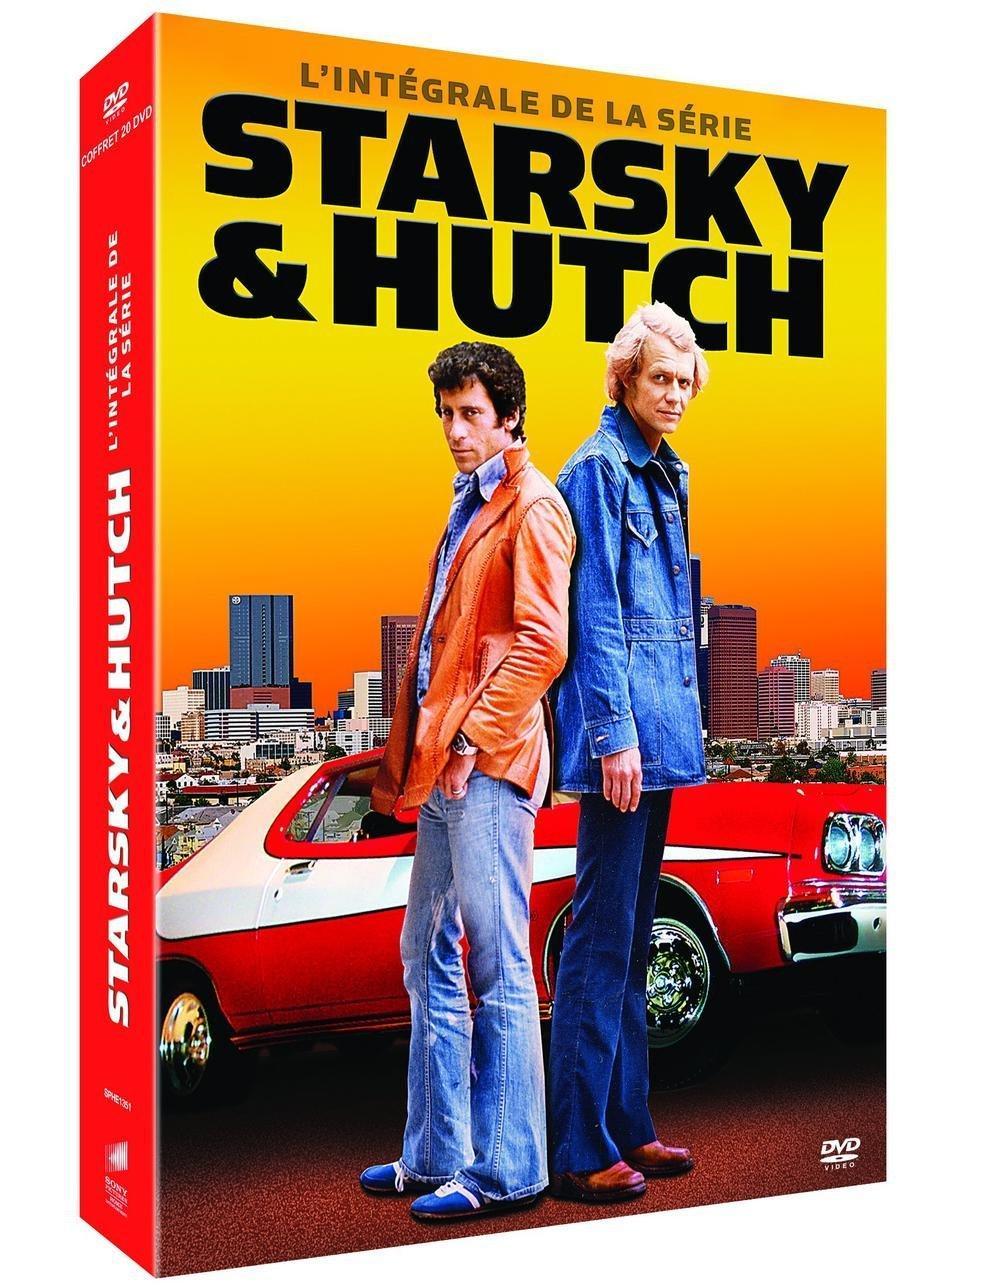 Coffret DVD : Starsky & Hutch - L'intégrale